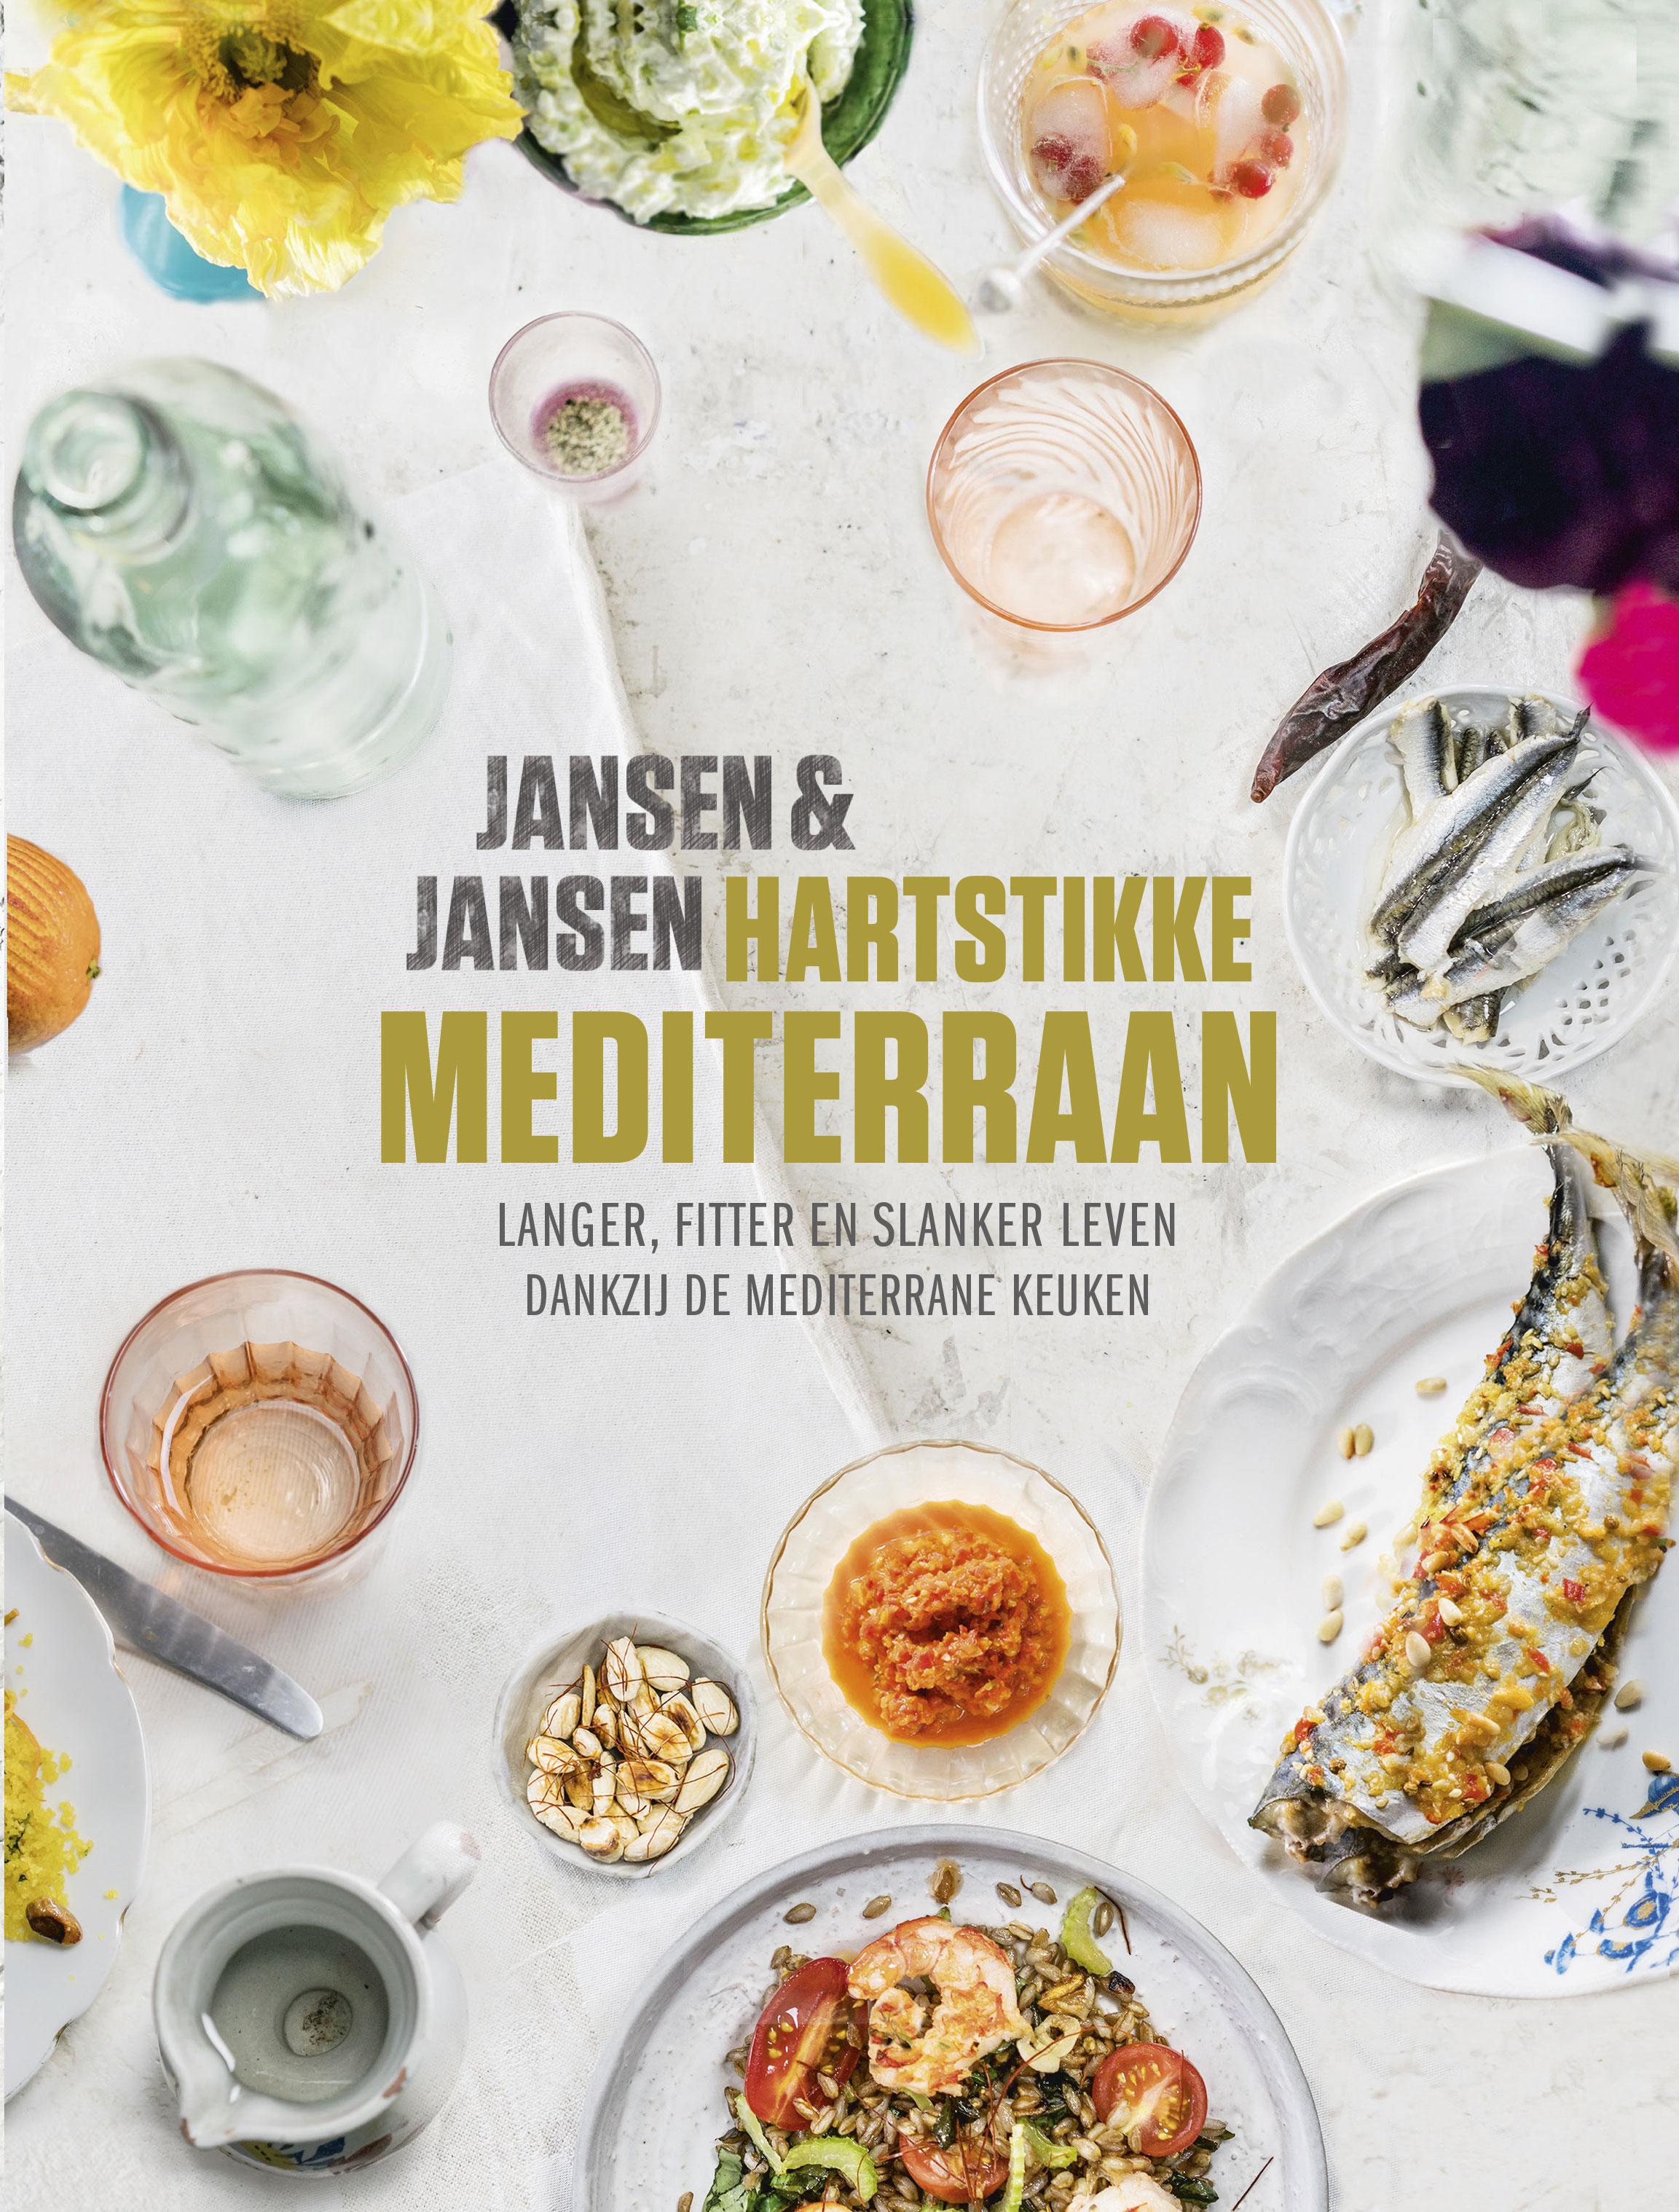 Hartstikke-mediterraan-boek